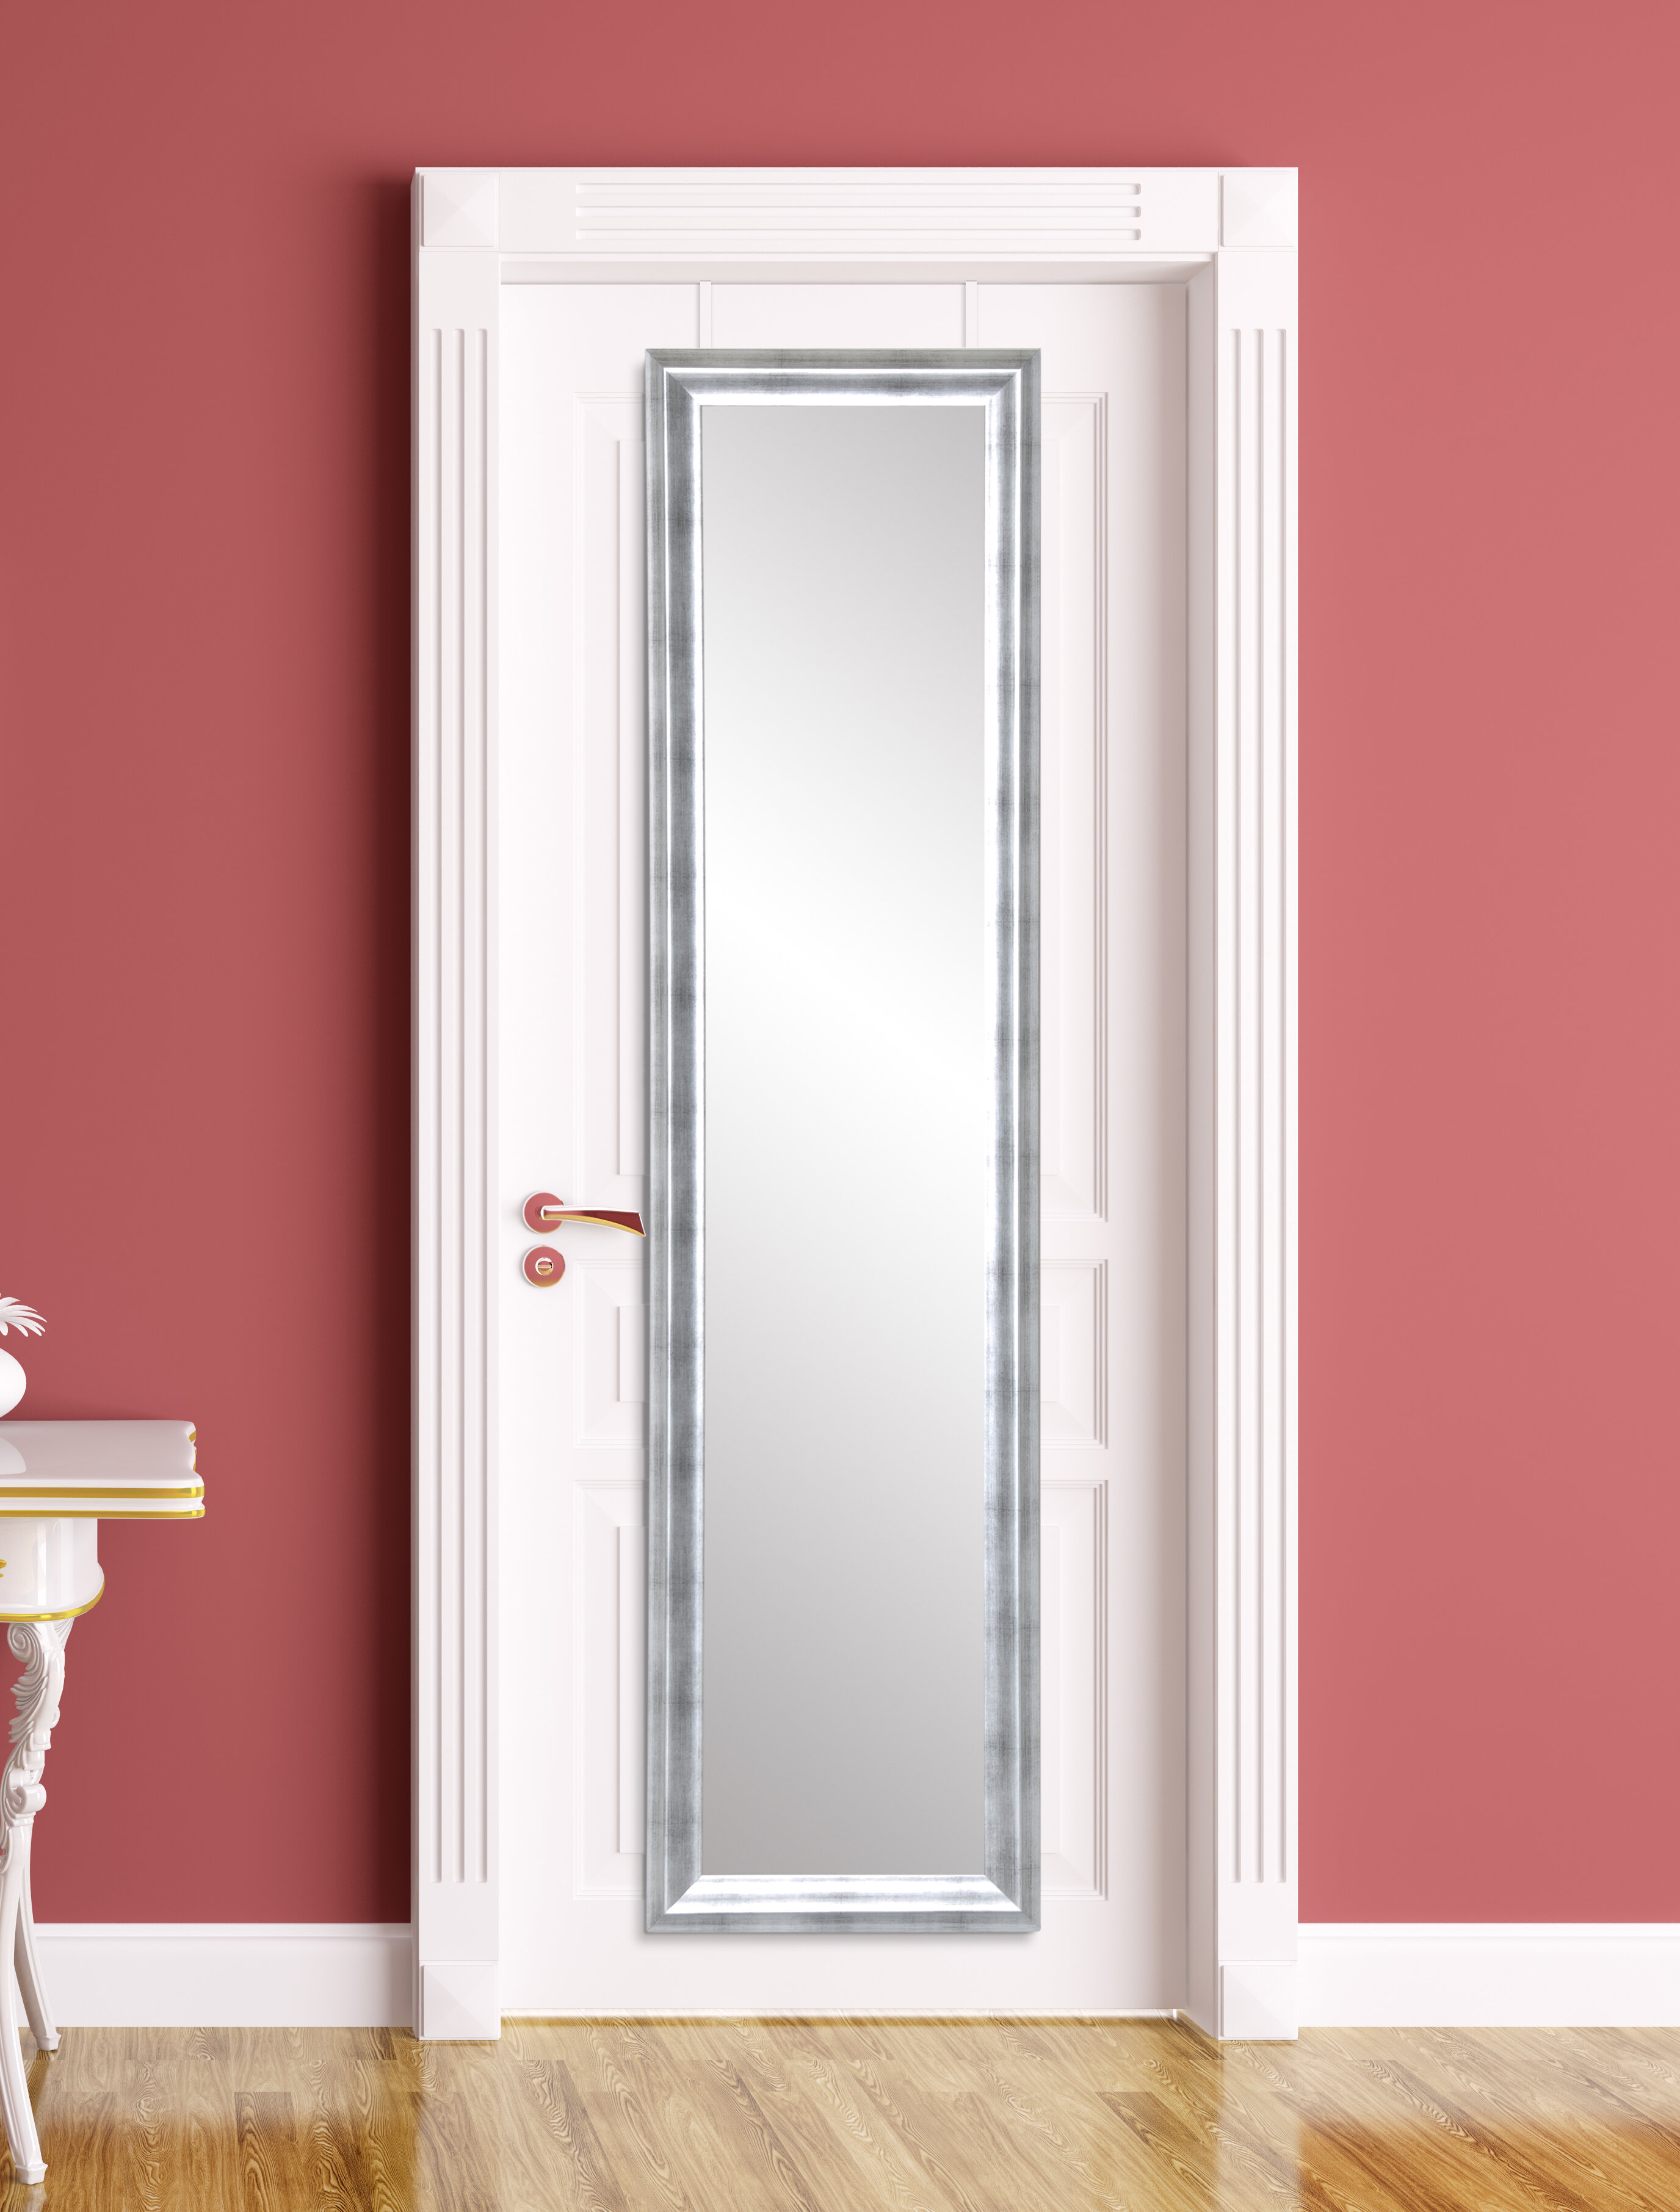 House Of Hampton Full Length Mirrors You Ll Love In 2021 Wayfair